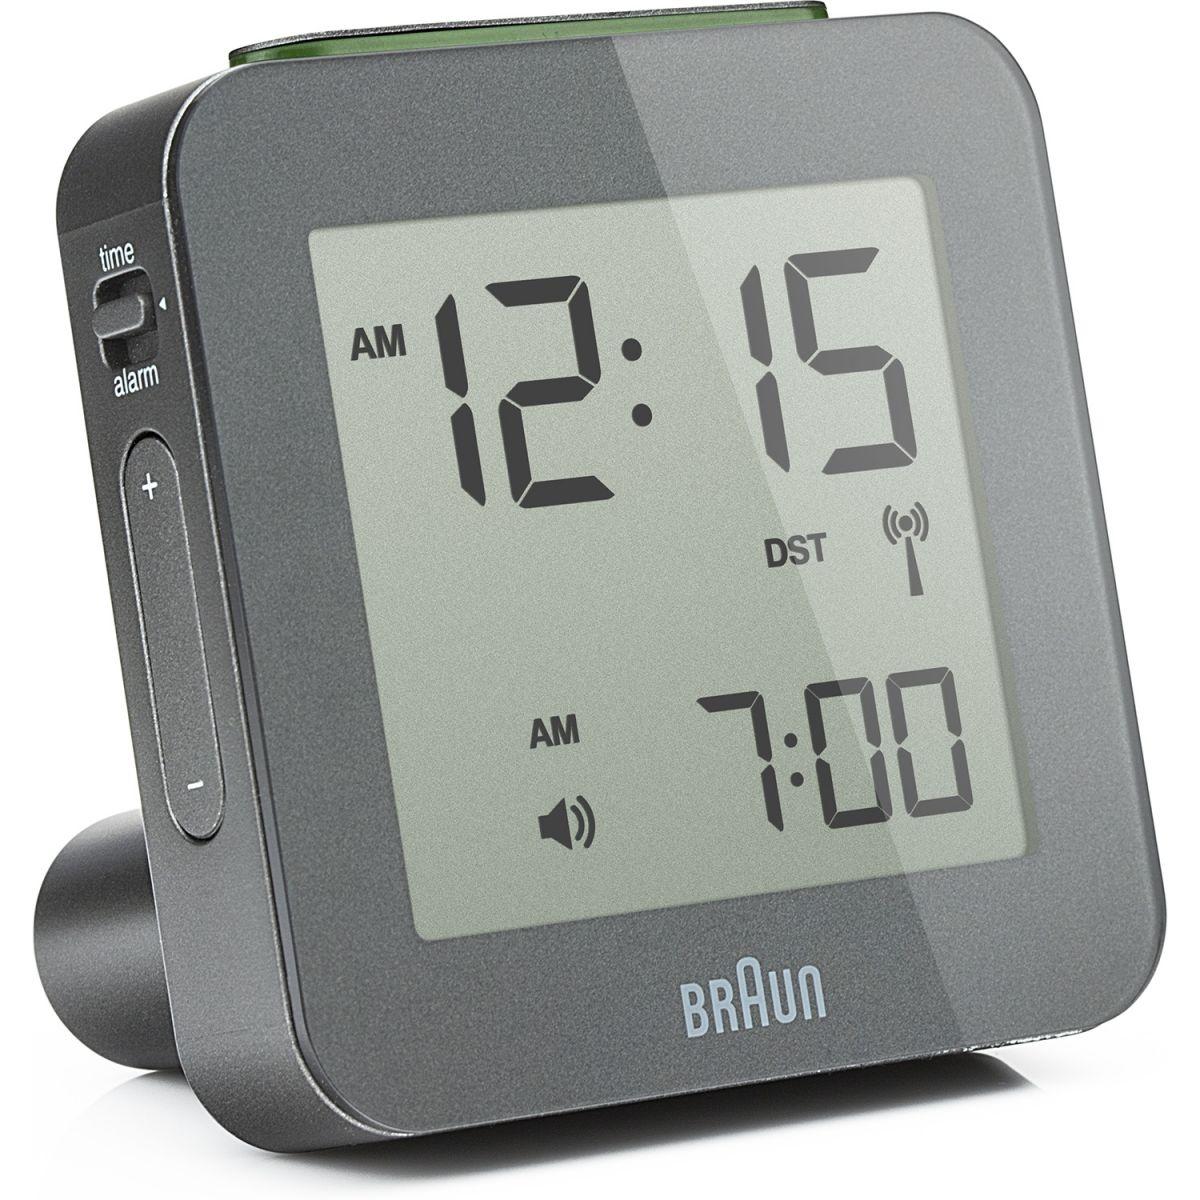 wanduhr braun clocks digital uhr wecker uhren bnc009gy rc. Black Bedroom Furniture Sets. Home Design Ideas